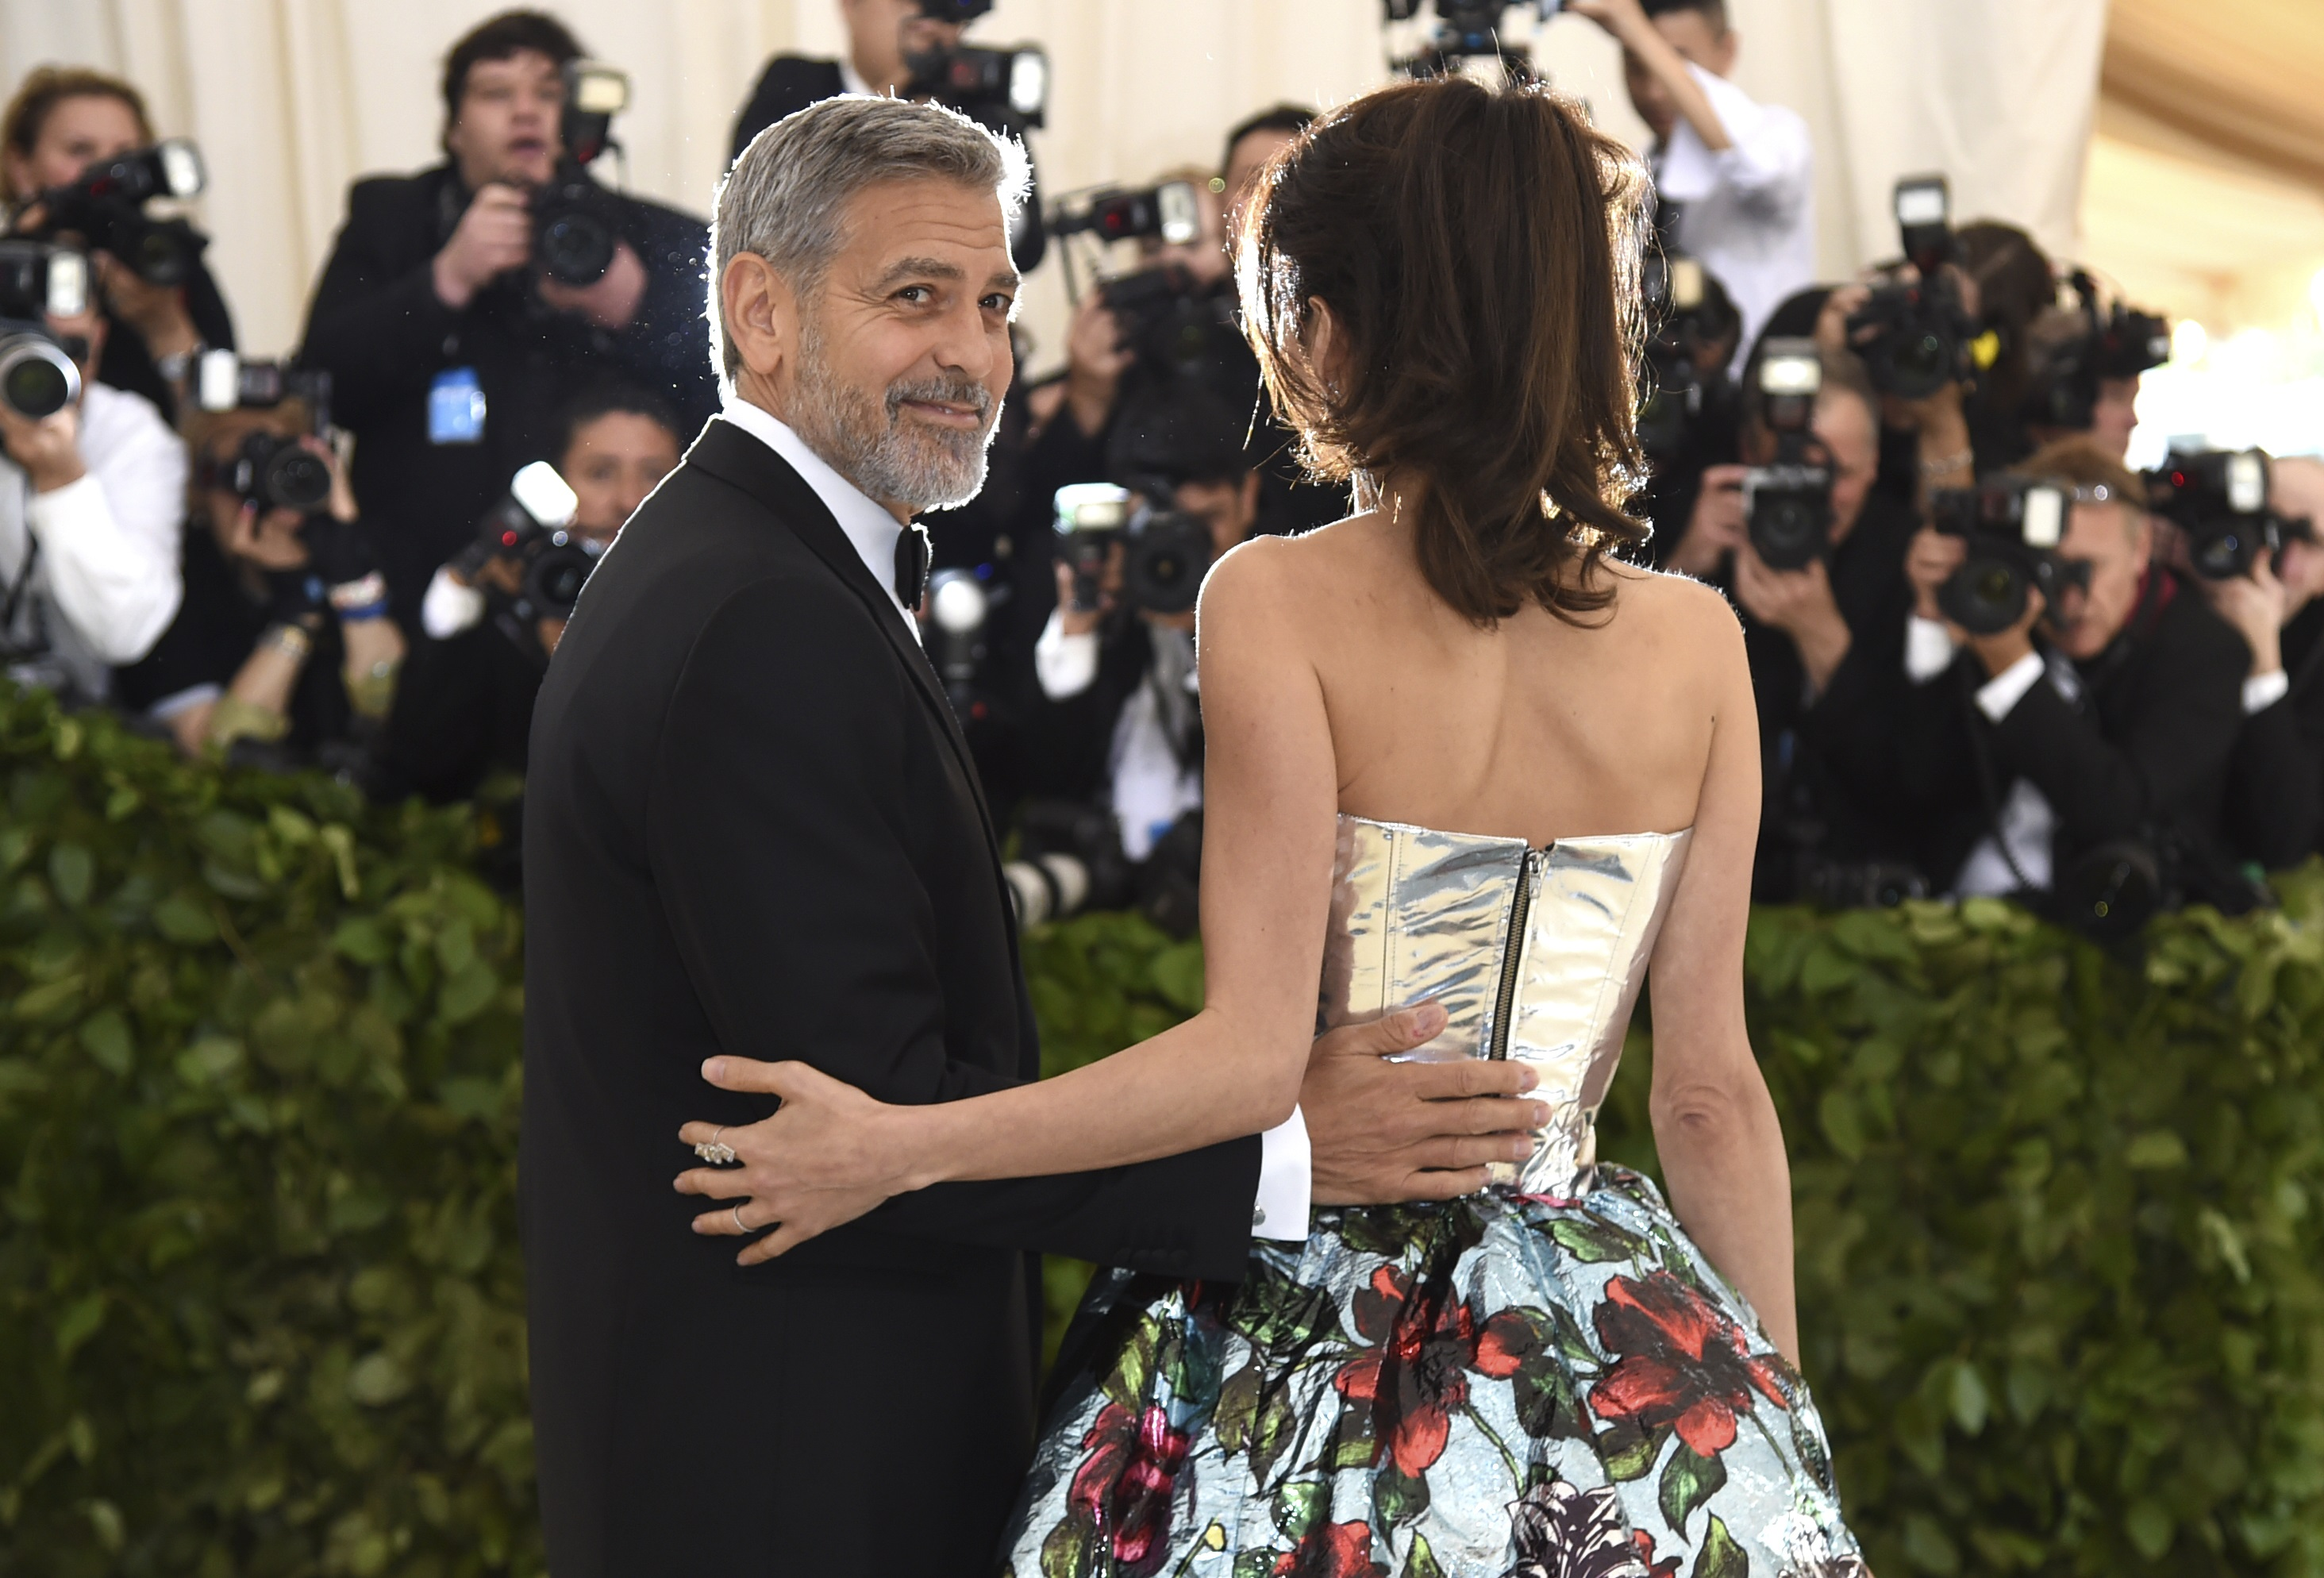 <div class='meta'><div class='origin-logo' data-origin='AP'></div><span class='caption-text' data-credit='Evan Agostini/Invision/AP'>George Clooney, left, and Amal Clooney. (Photo by Evan Agostini/Invision/AP)</span></div>